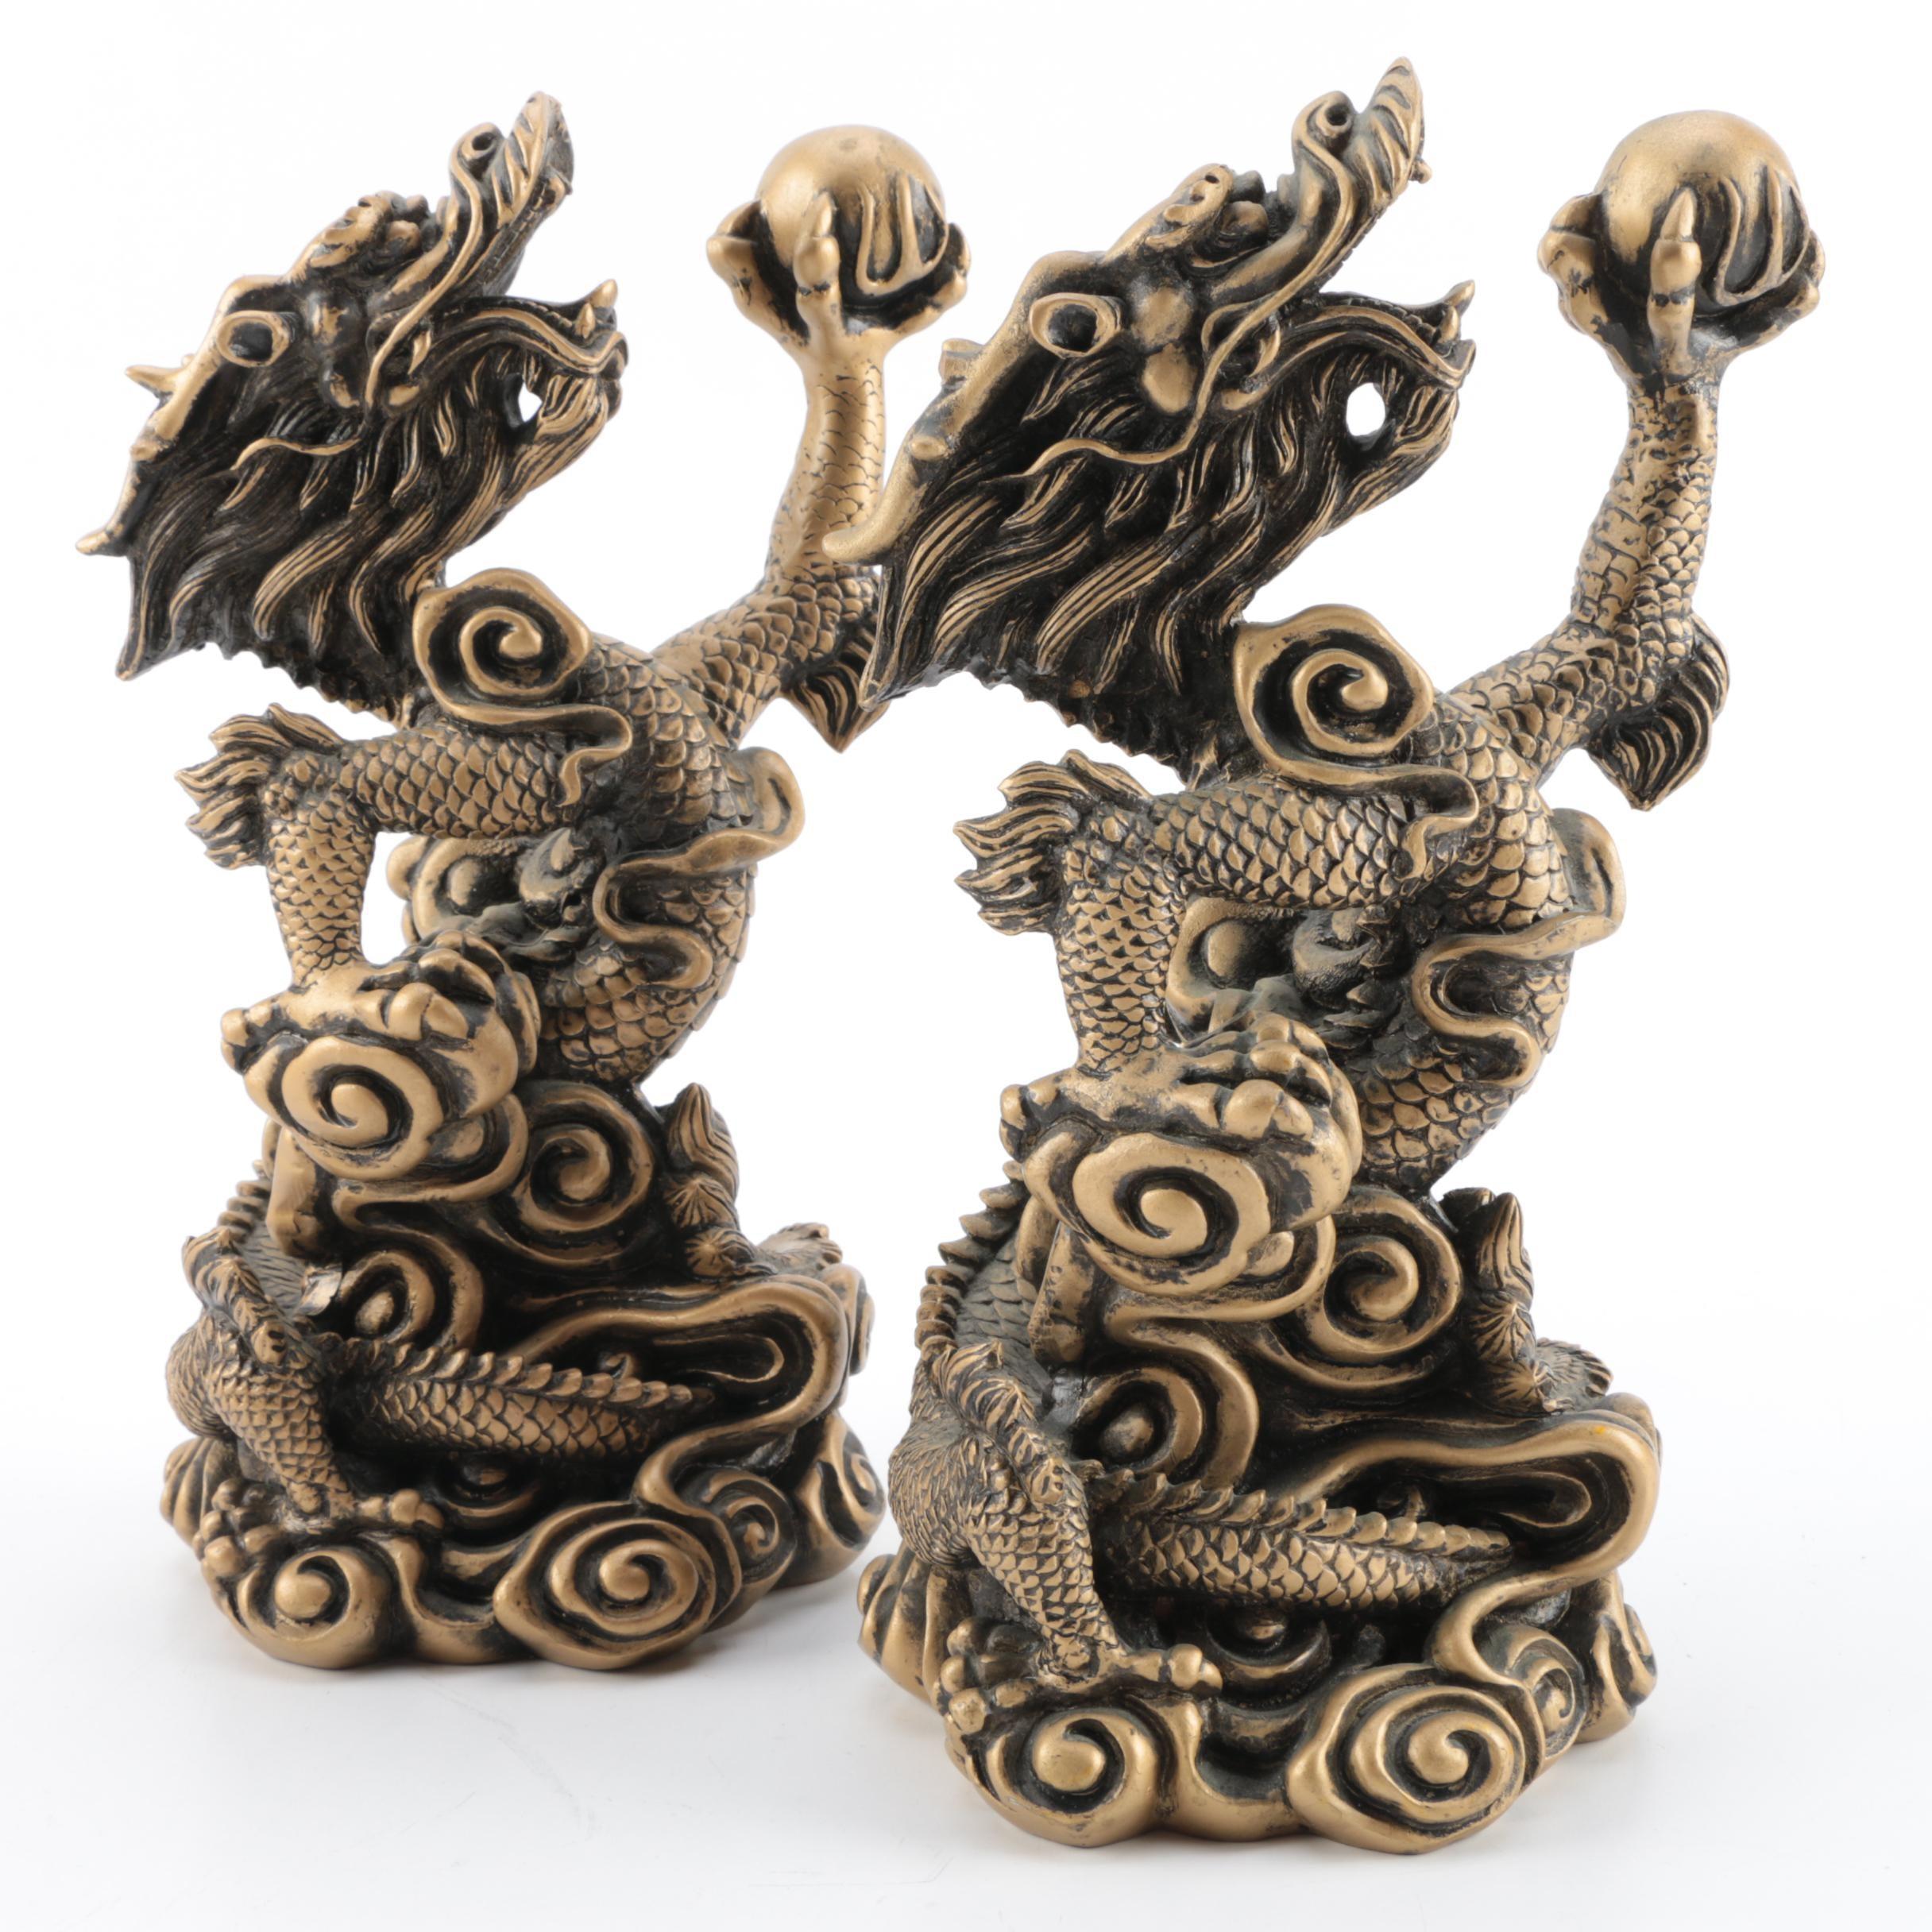 Chinese Dragon Figurines